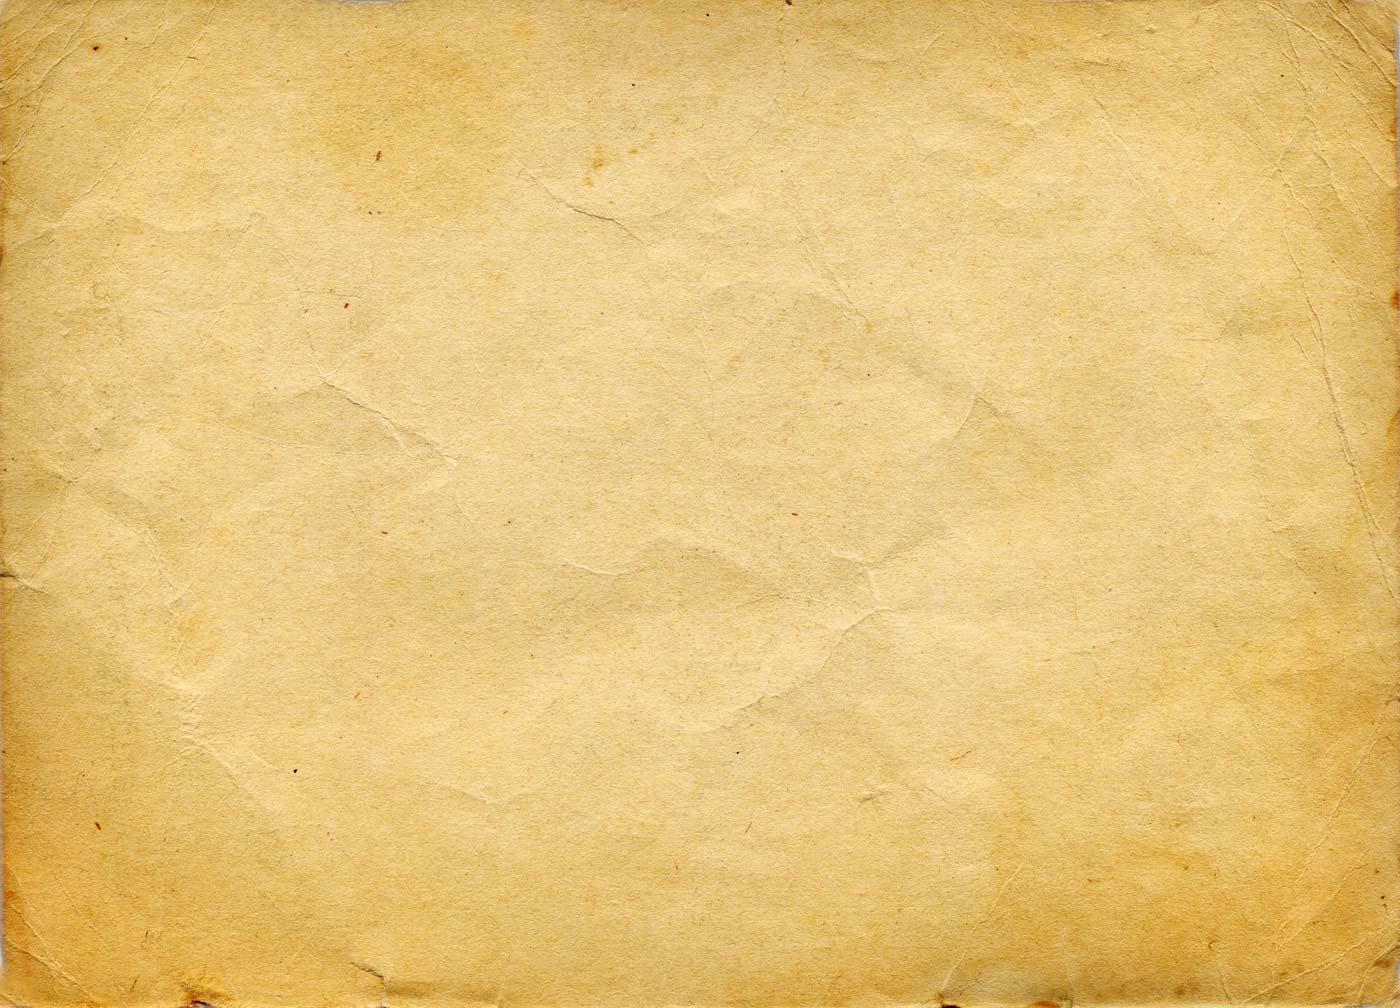 Бумага старая мд поиск